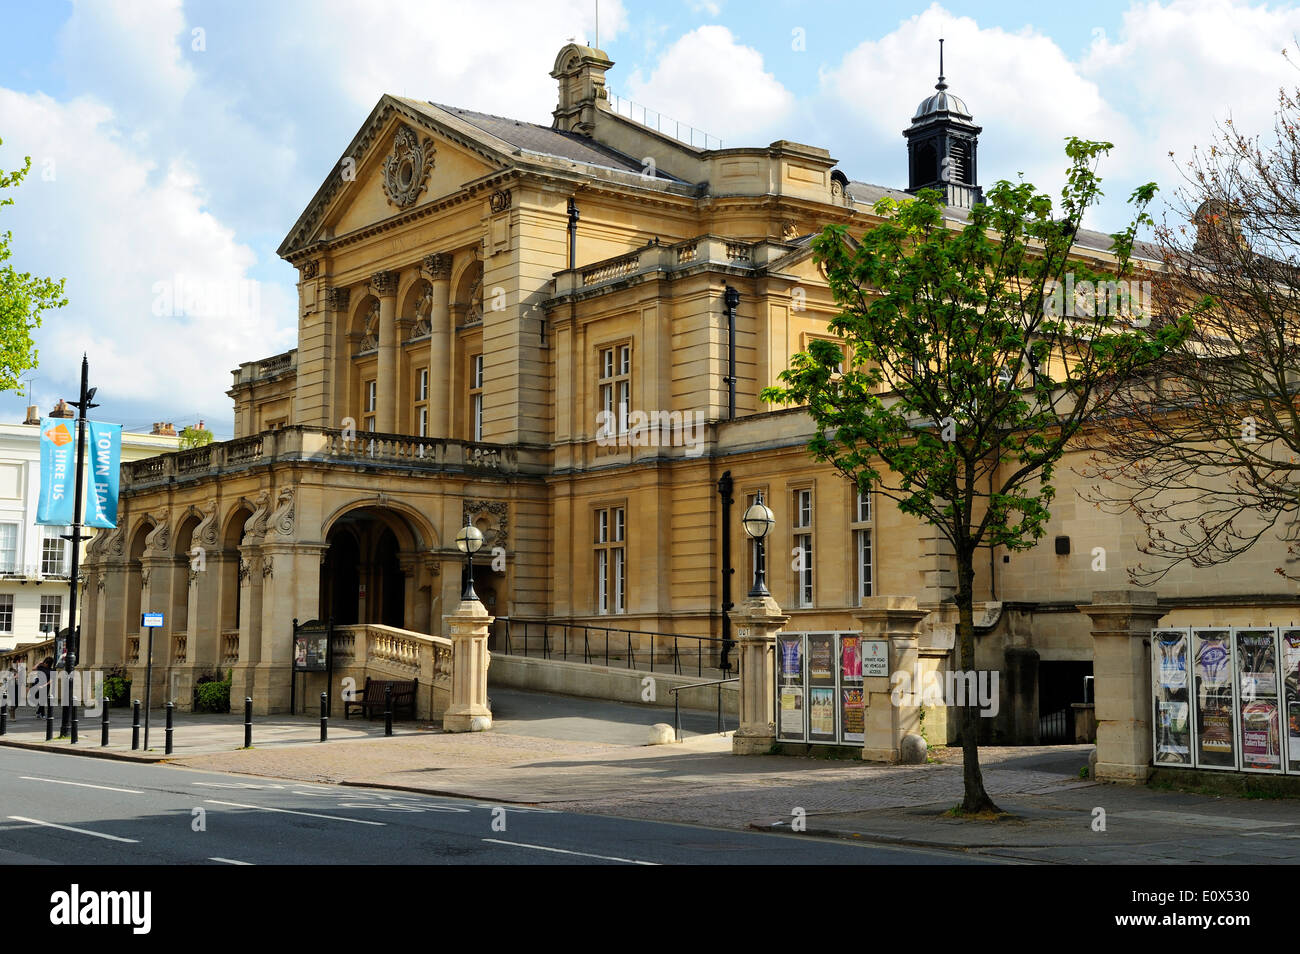 The Town Hall, Cheltenham, Gloucestershire, England - Stock Image